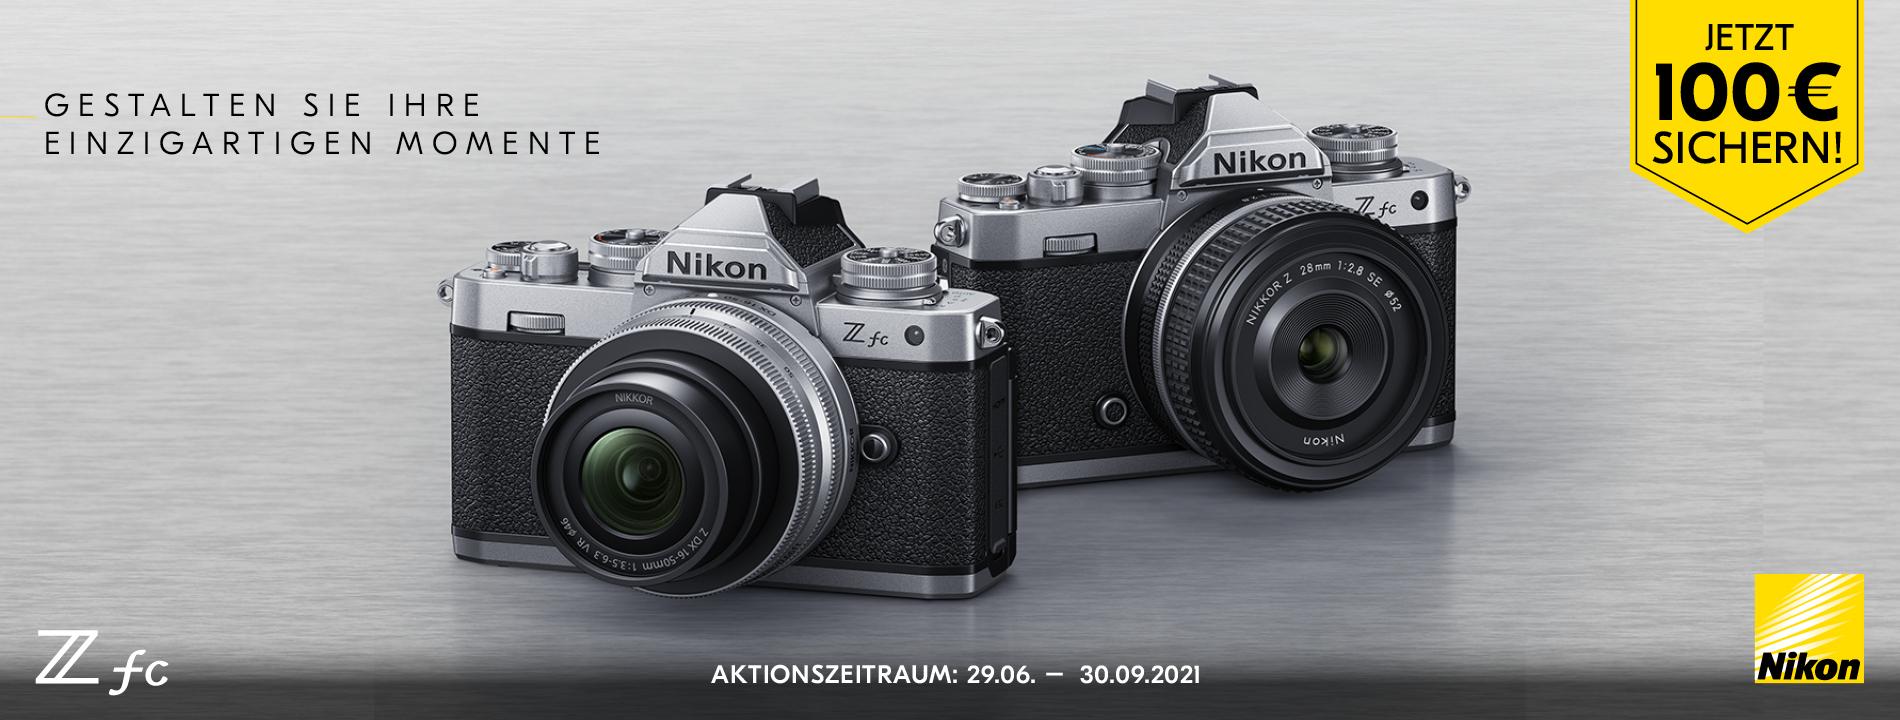 Foto Meyer Berlin Cashback und Sparaktionen:  NIKON Z fc AKTION